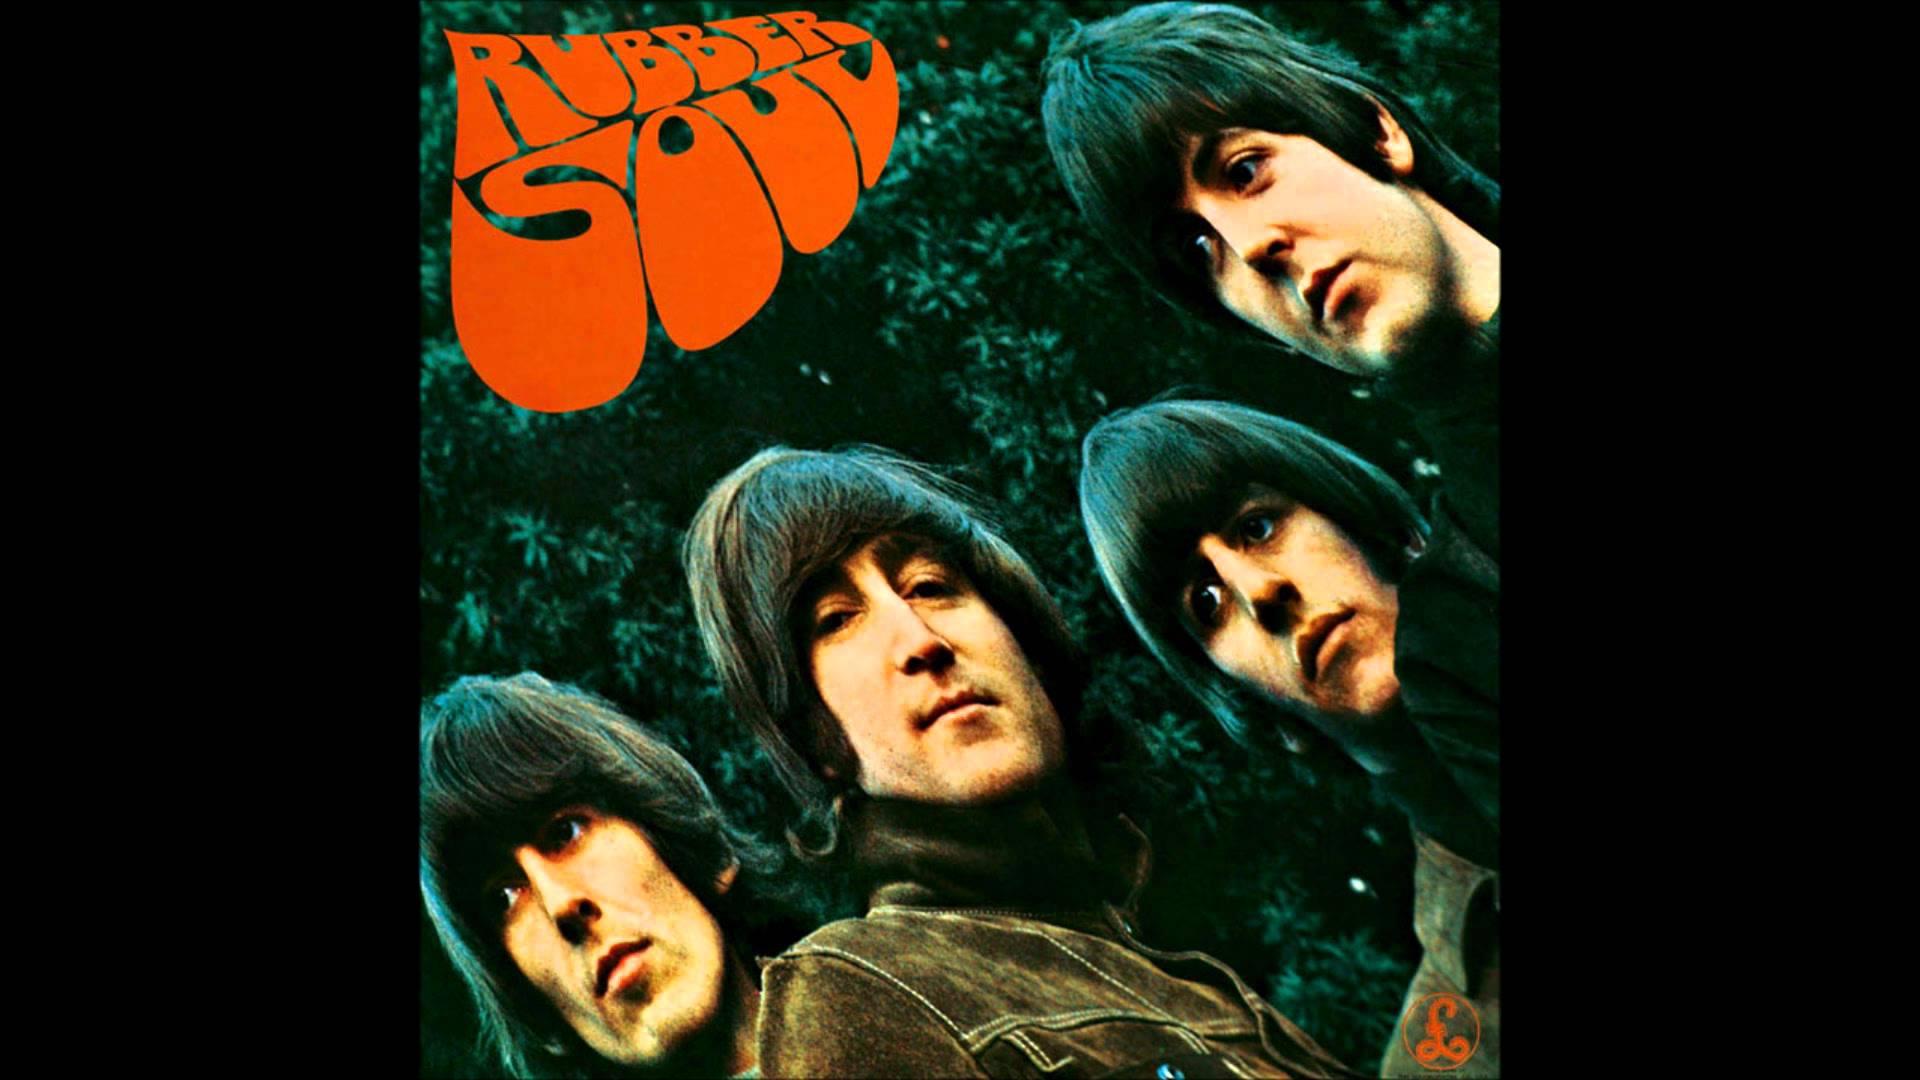 Rubber Soul number 1